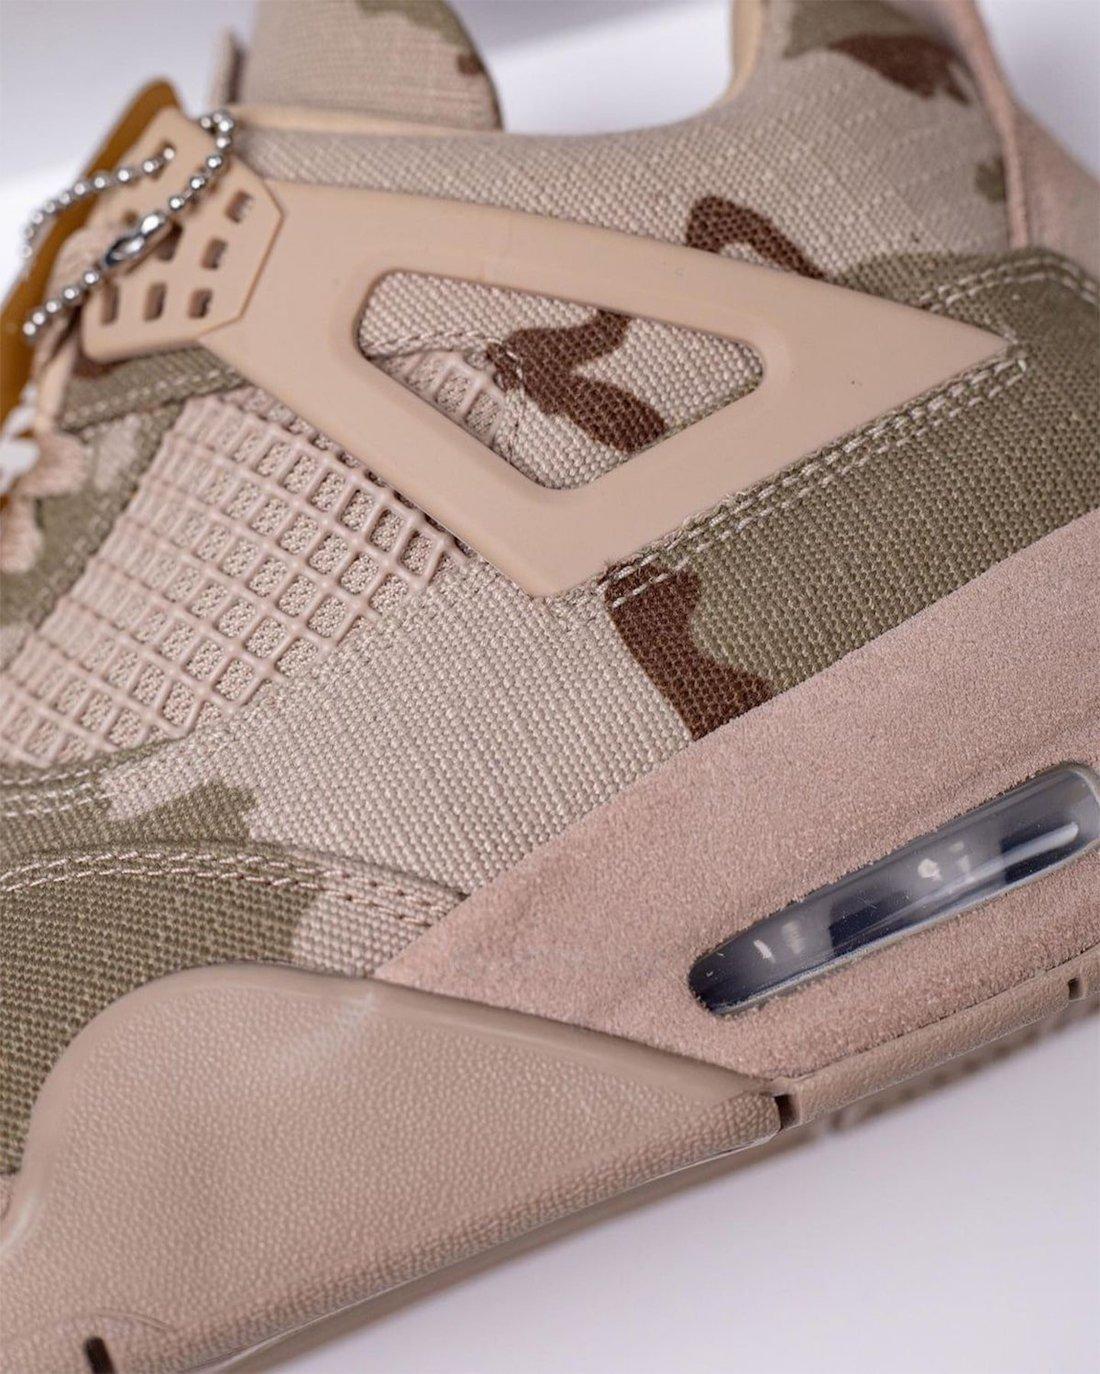 Aleali May Air Jordan 4 Camo Veterans Day DJ1193-200